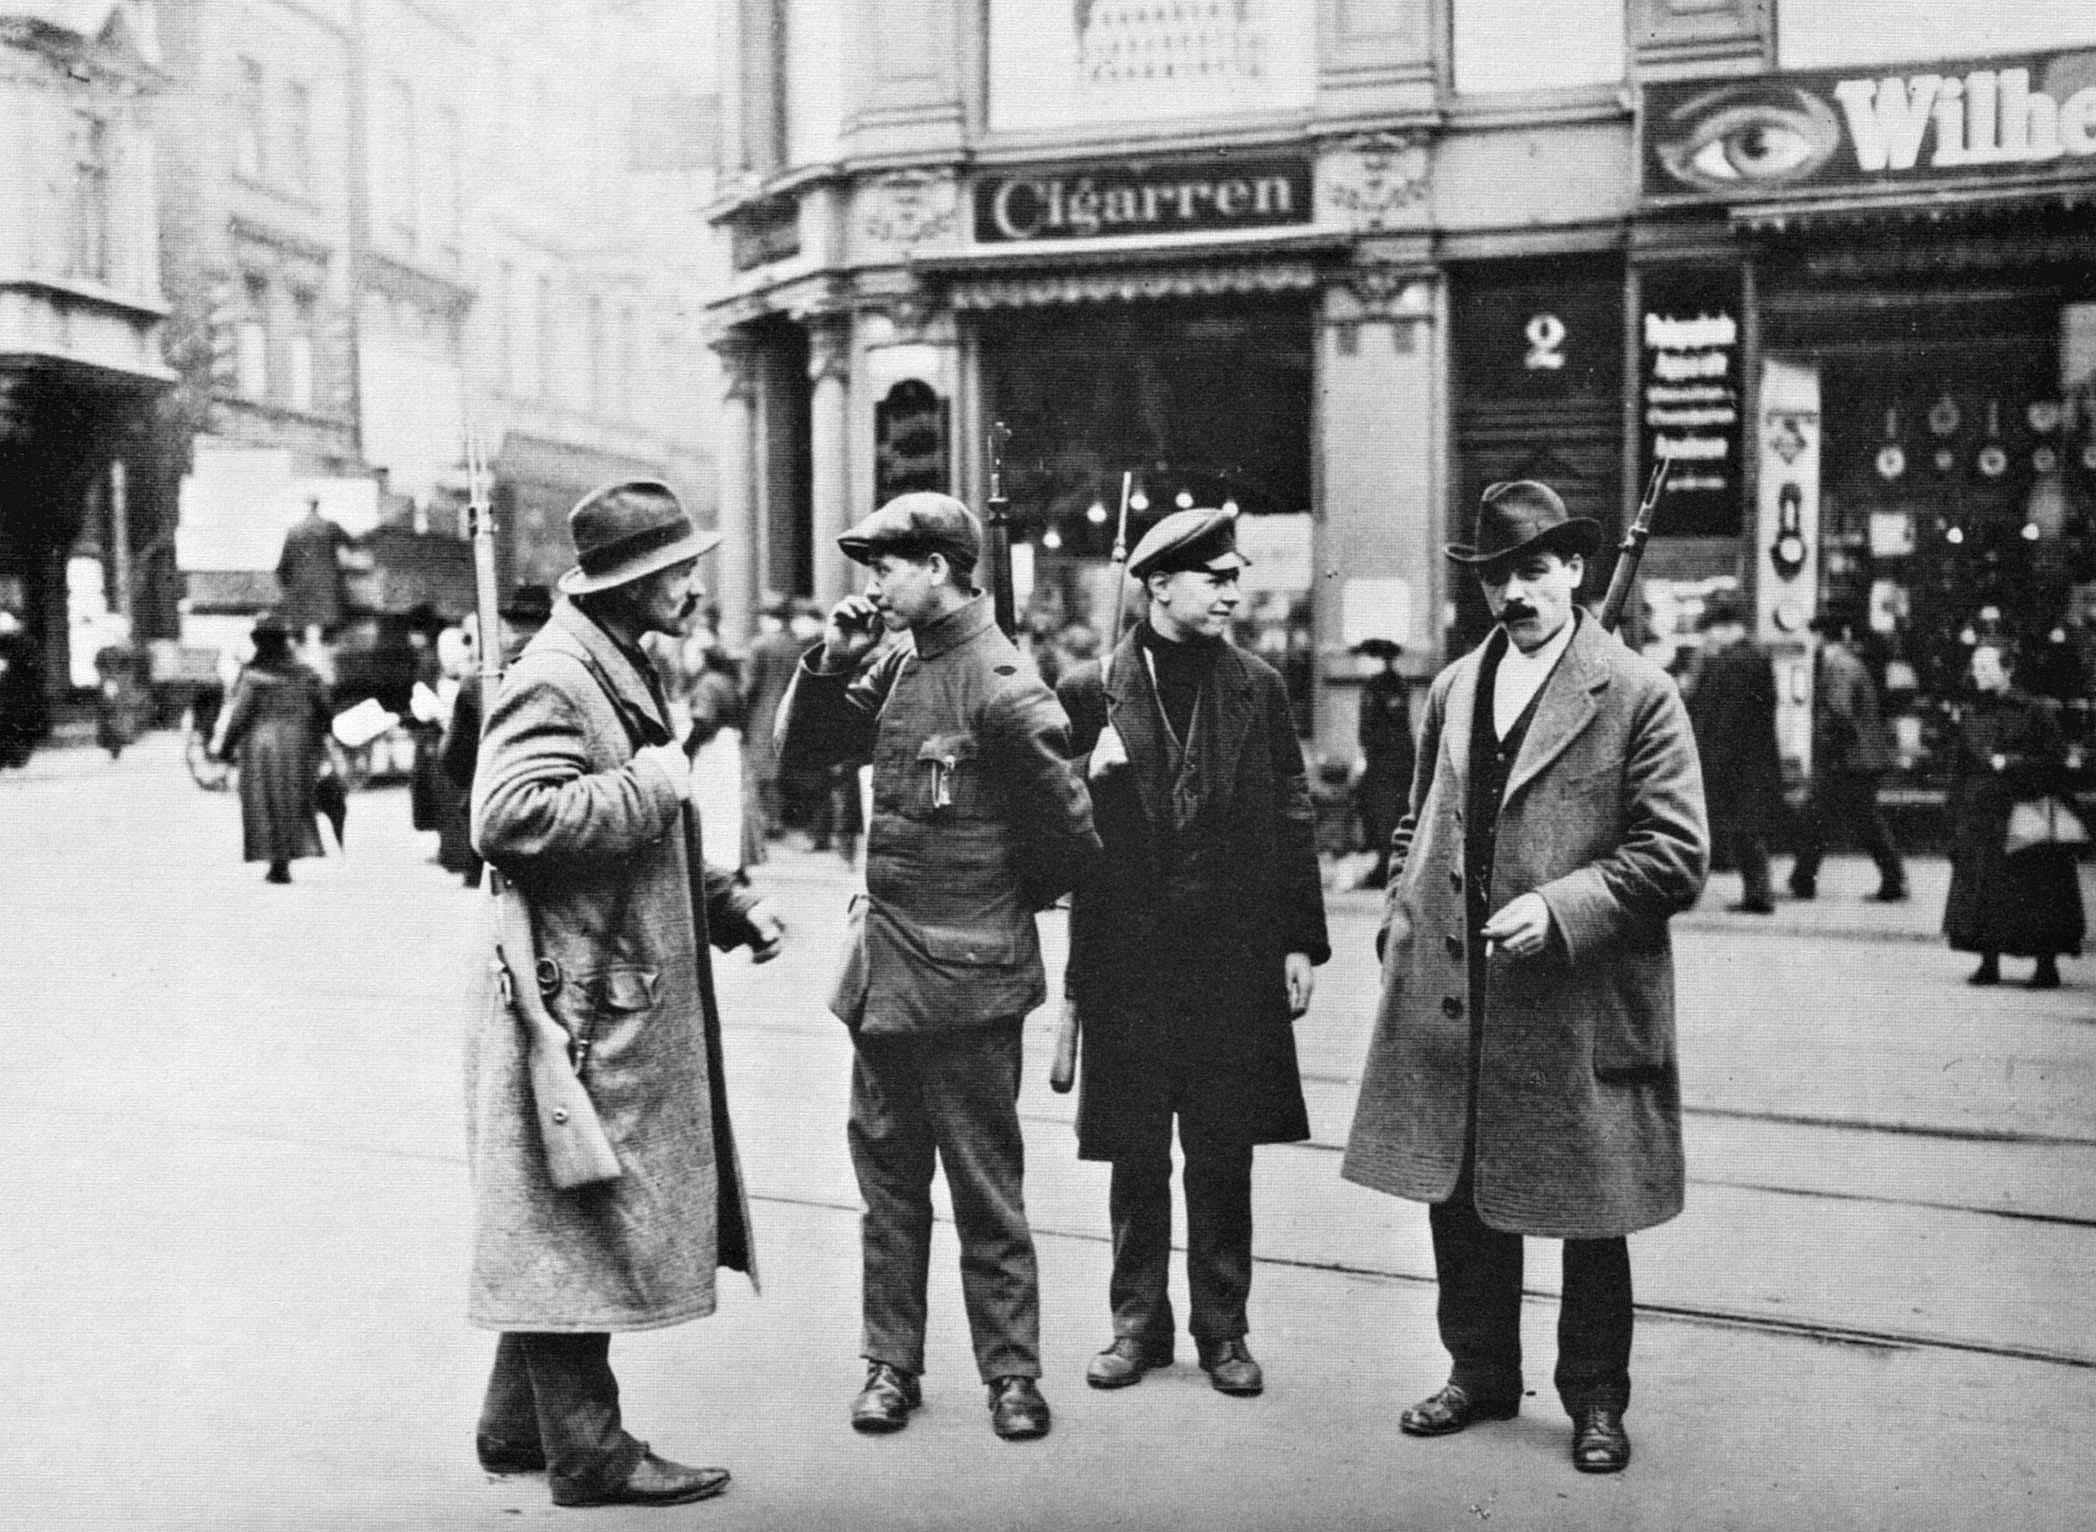 1920. Ruhr vidéki felkelés alatt, kommunisták járőröznek Weimarban..jpg